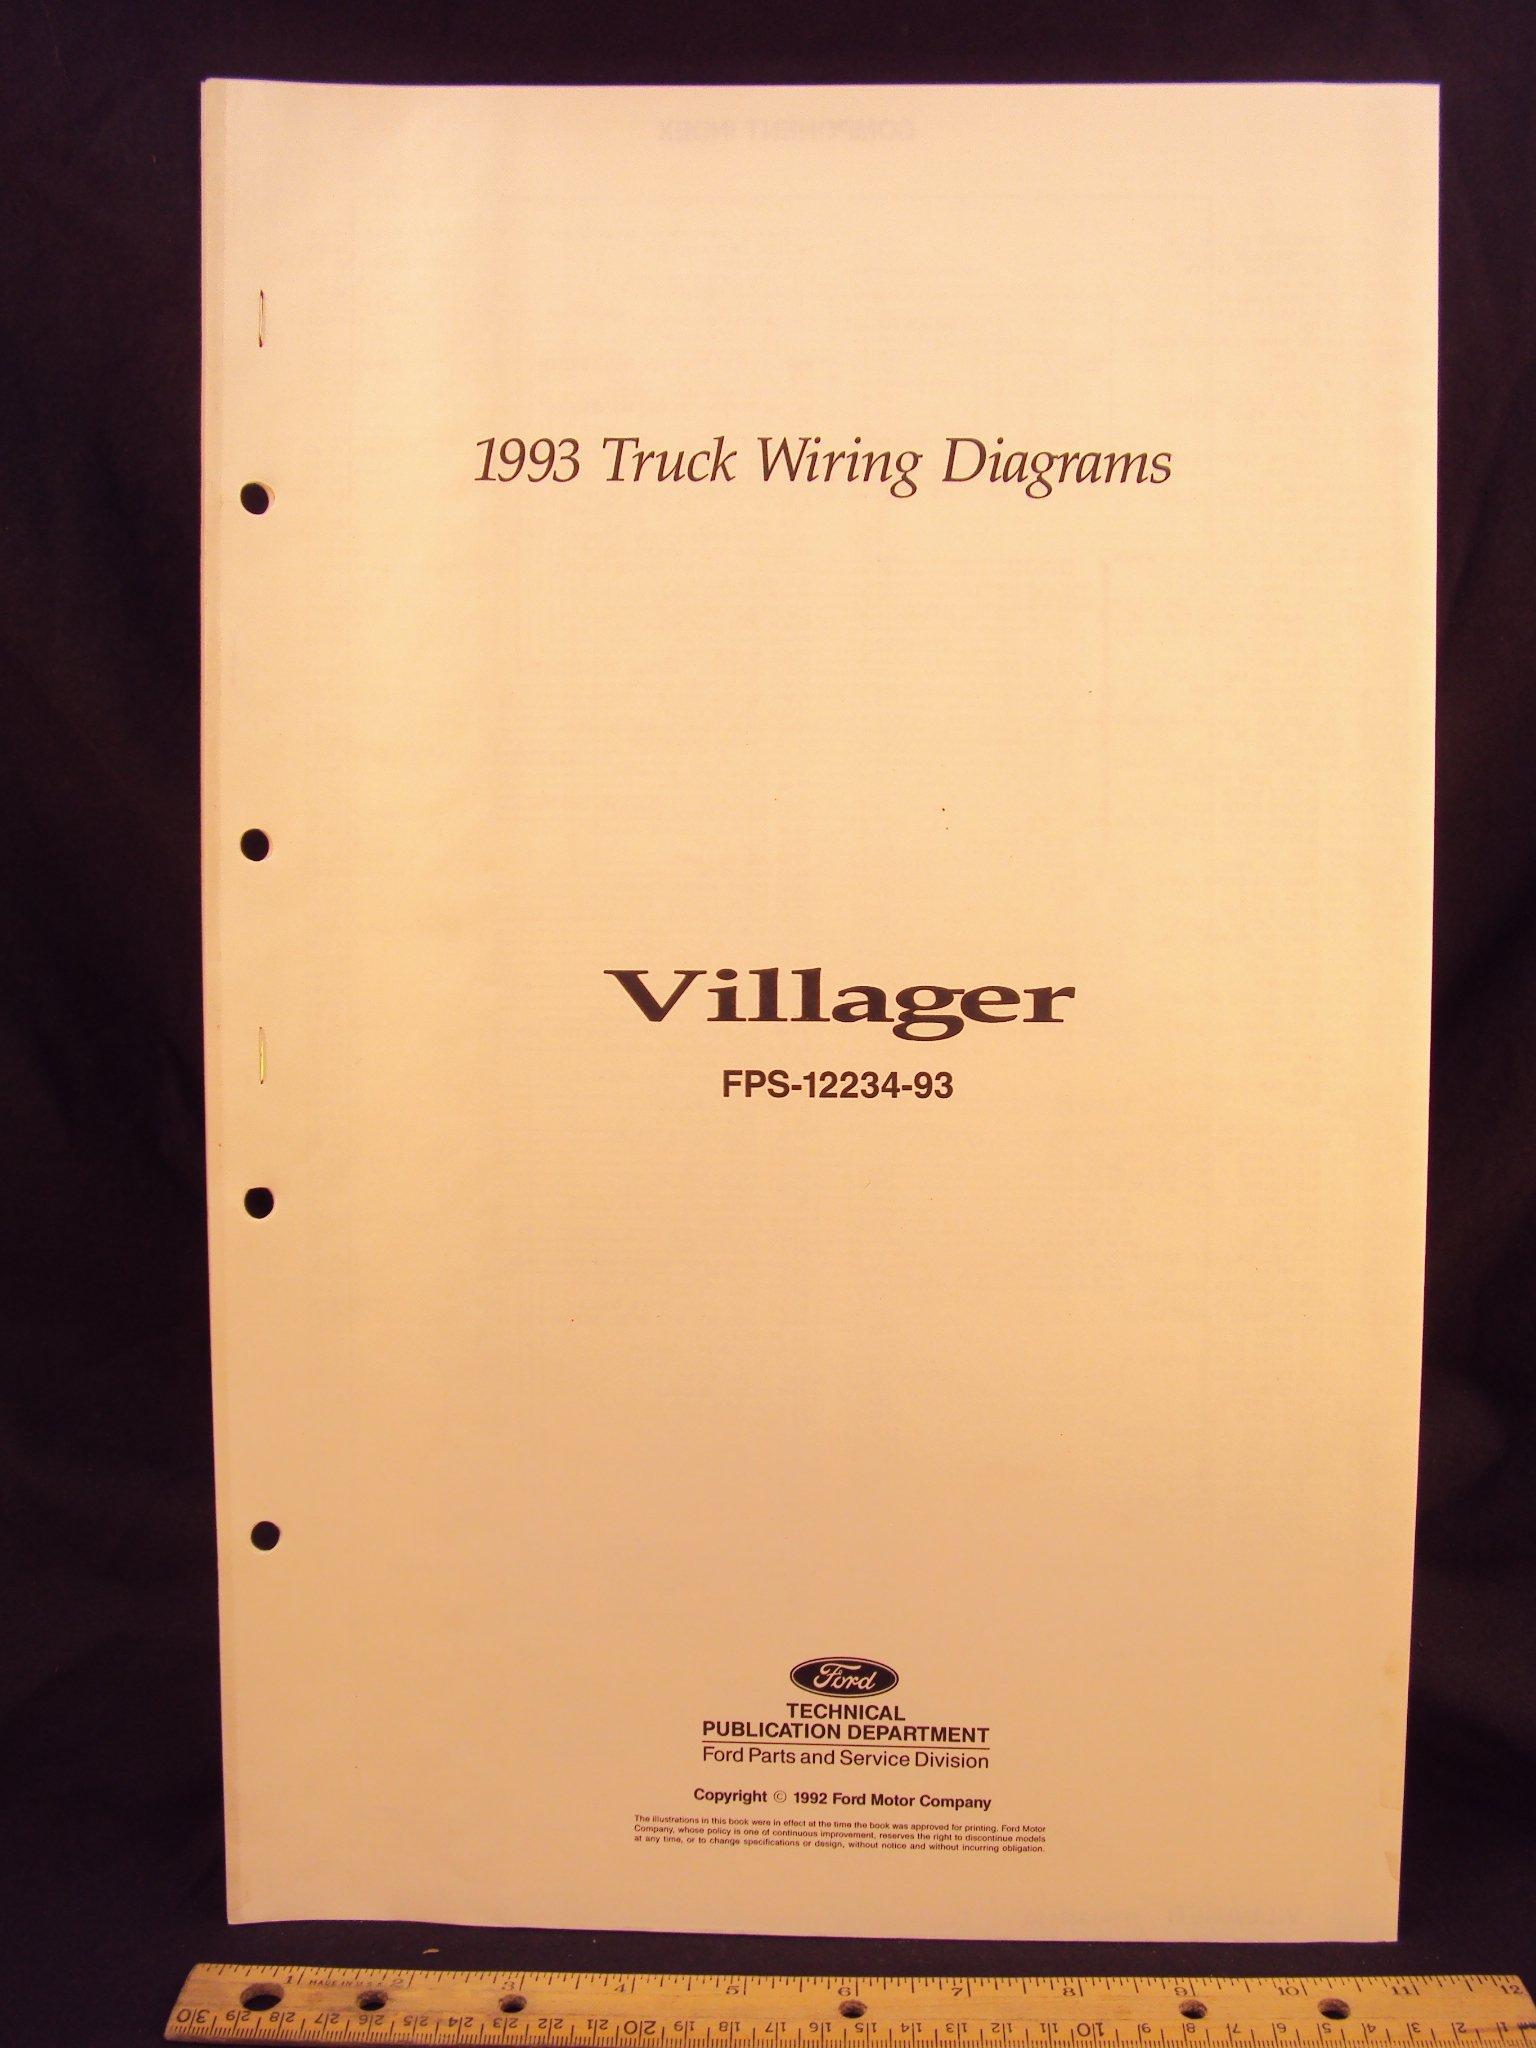 [DIAGRAM_38EU]  1993 MERCURY Villager Mini Van Electrical Wiring Diagrams / Schematics:  Ford Motor Company: Amazon.com: Books | 1993 Mercury Villager Wiring Diagram |  | Amazon.com